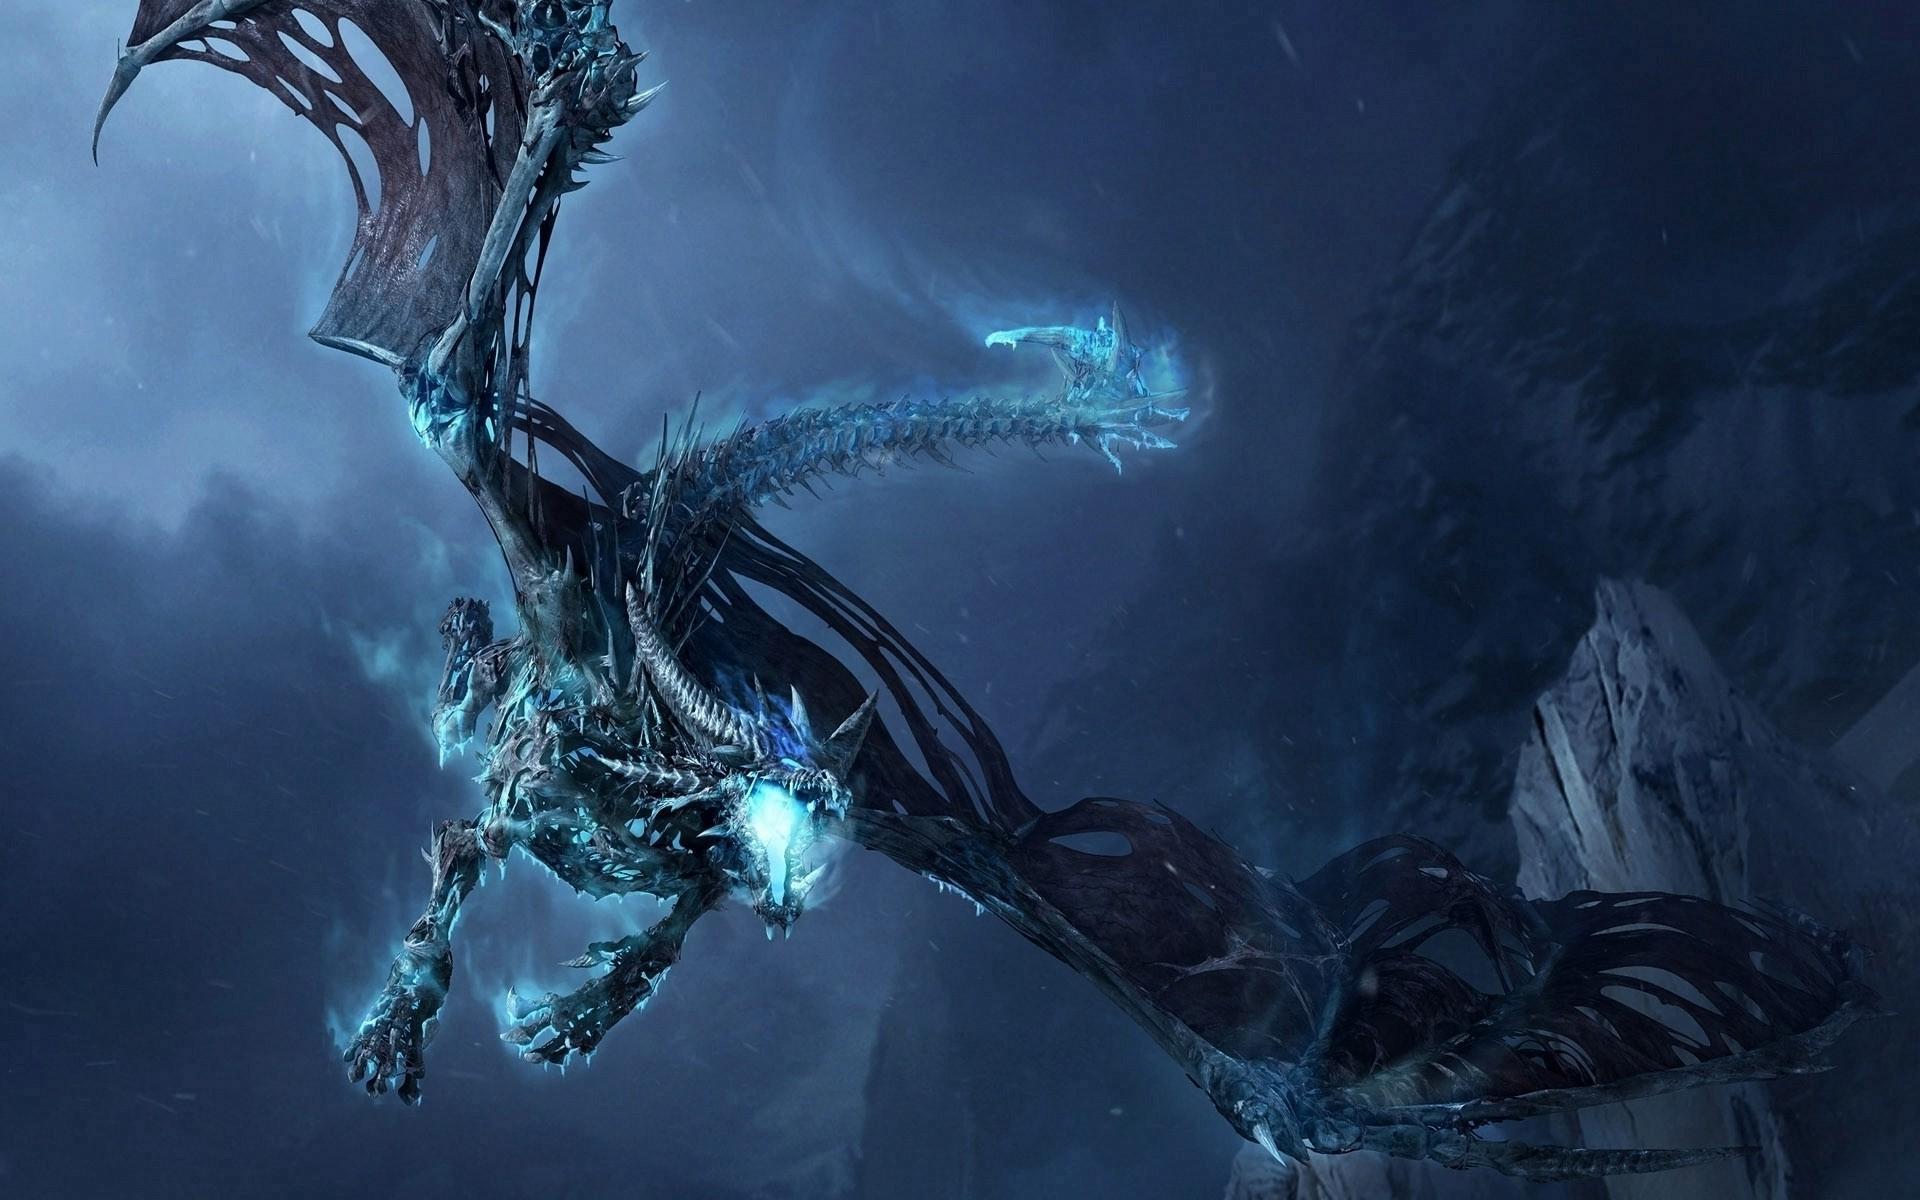 Blue And Black Dragon - HD Wallpaper